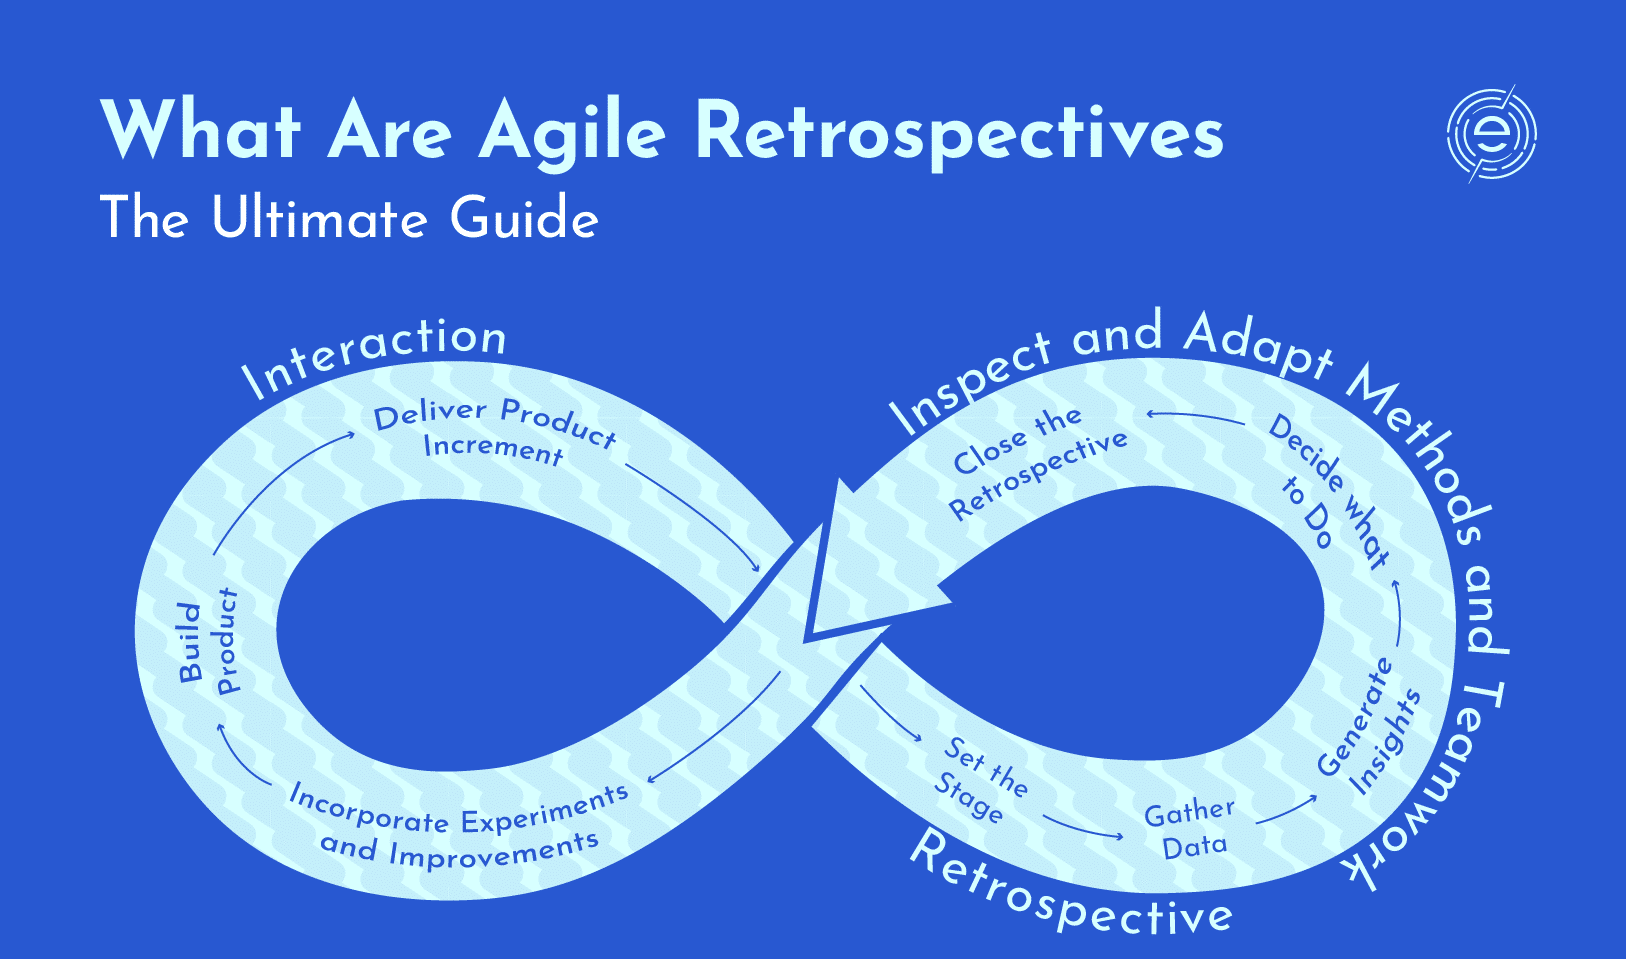 WHAT IS AN AGILE RETROSPECTIVE